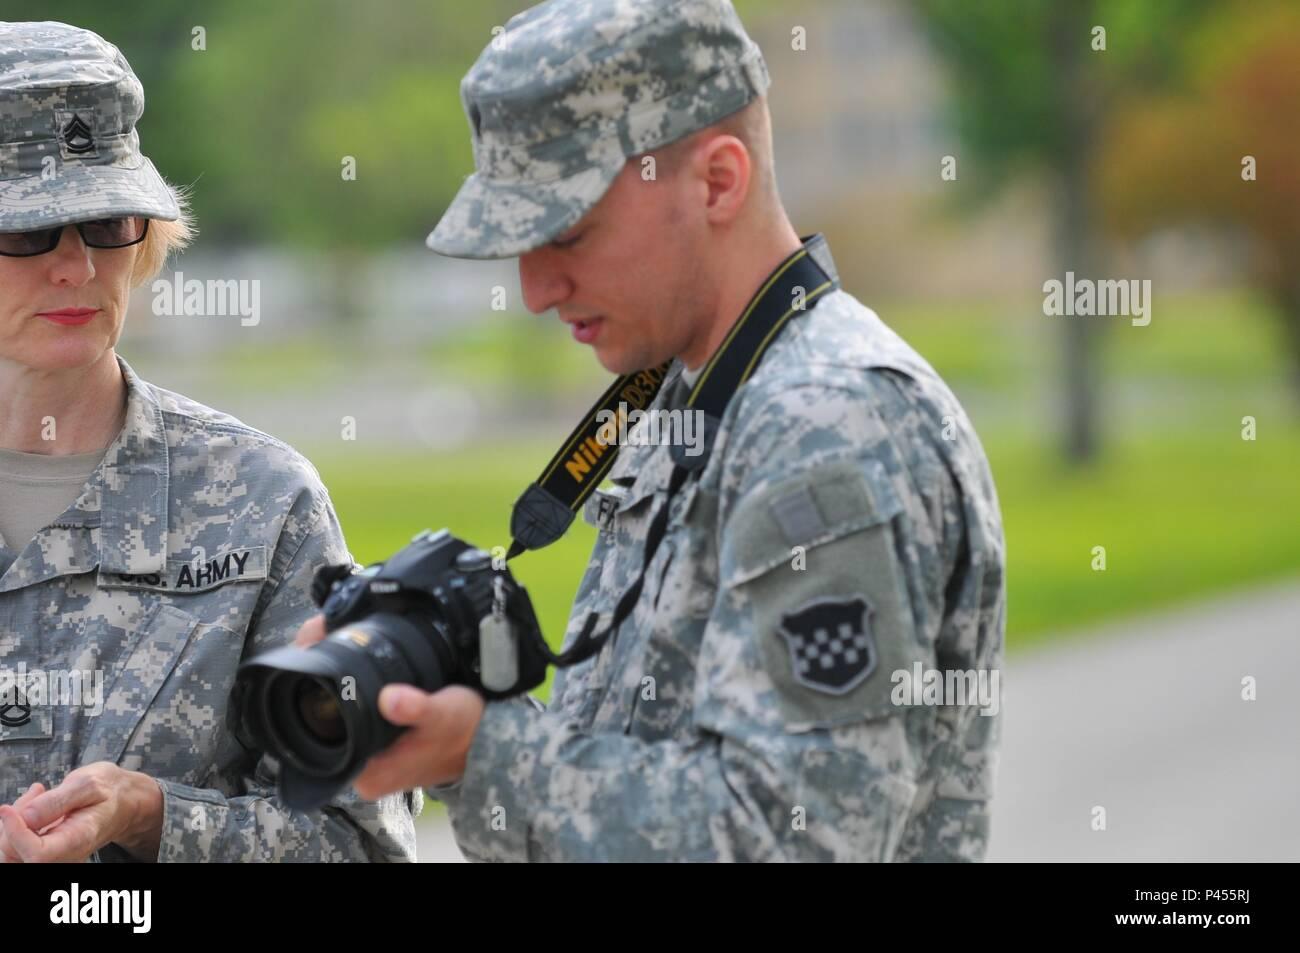 Sgt. 1st Class Elizabeth Breckenkamp (on left) trains Spec. Joe Falsetta on the Nikon D300 camera at Muscatatuck Urban Training Center, Ind., on June 14, 2016. - Stock Image